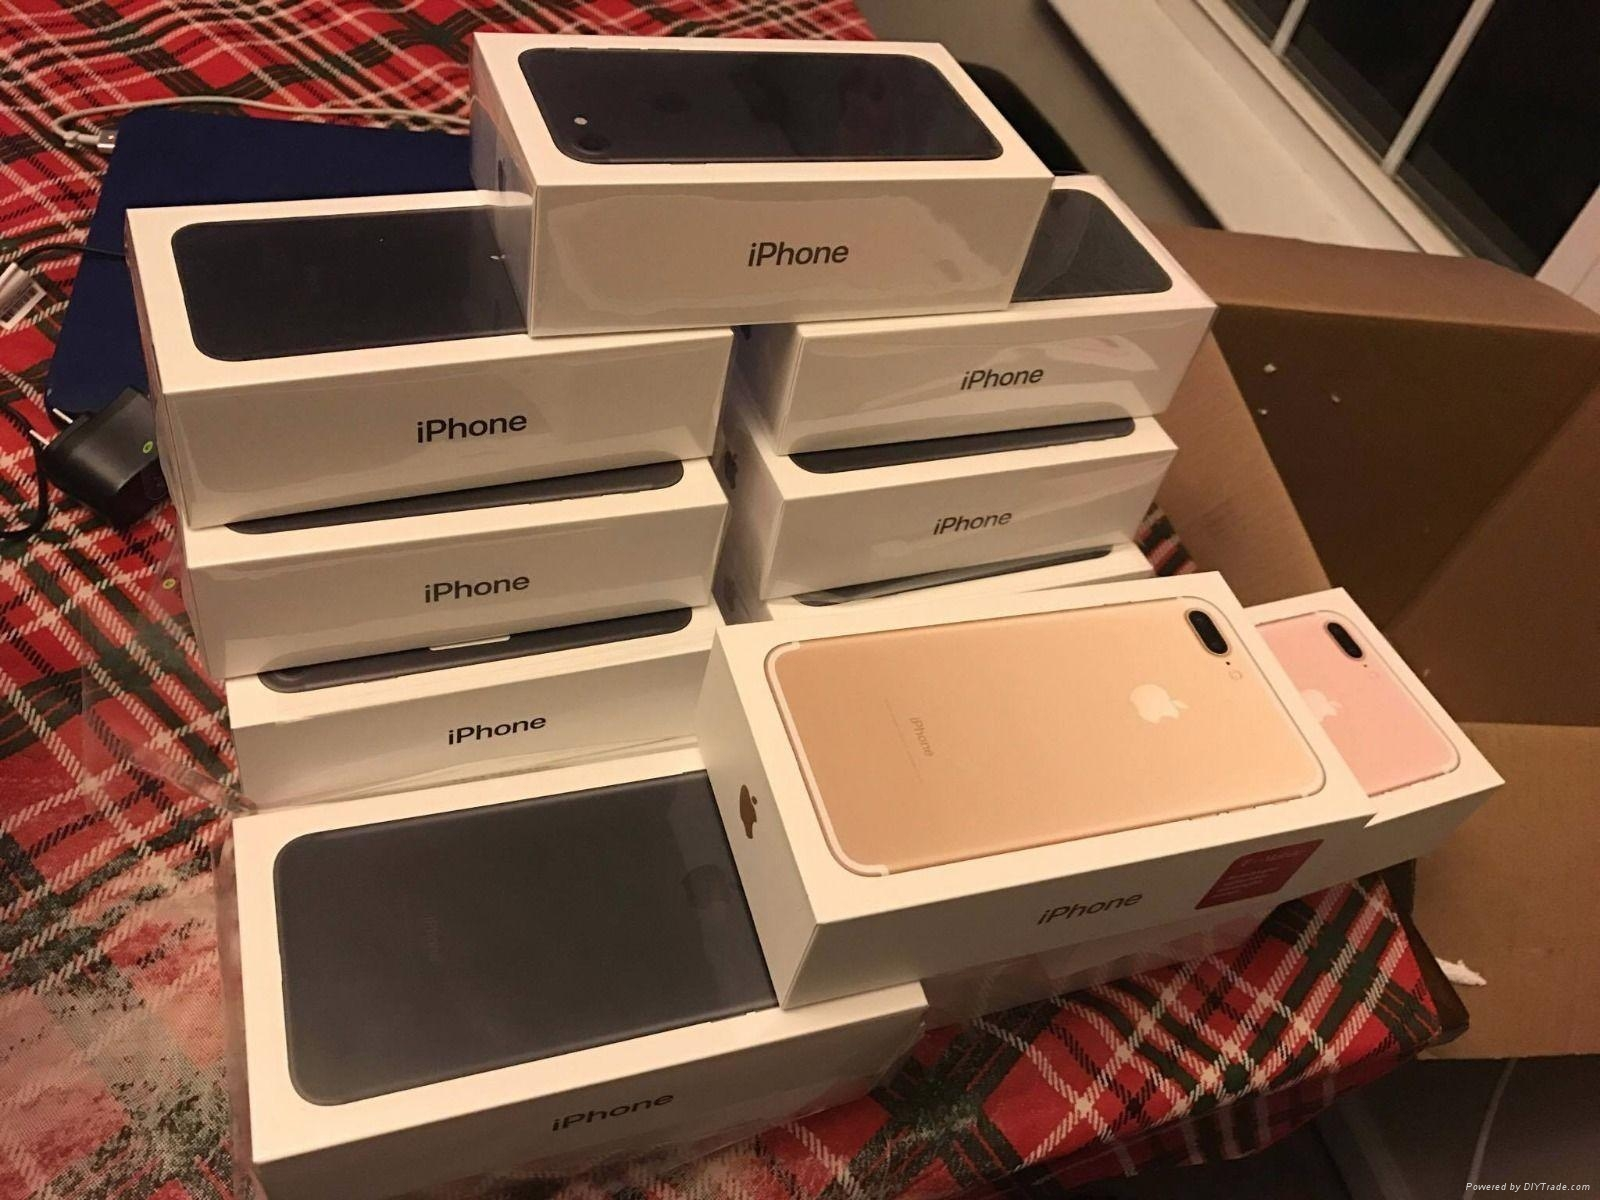 (NEW & SEALED) Unlocked APPLE iPHONE 7 PLUS 32GB,128GB,256GB Factory Unlocked